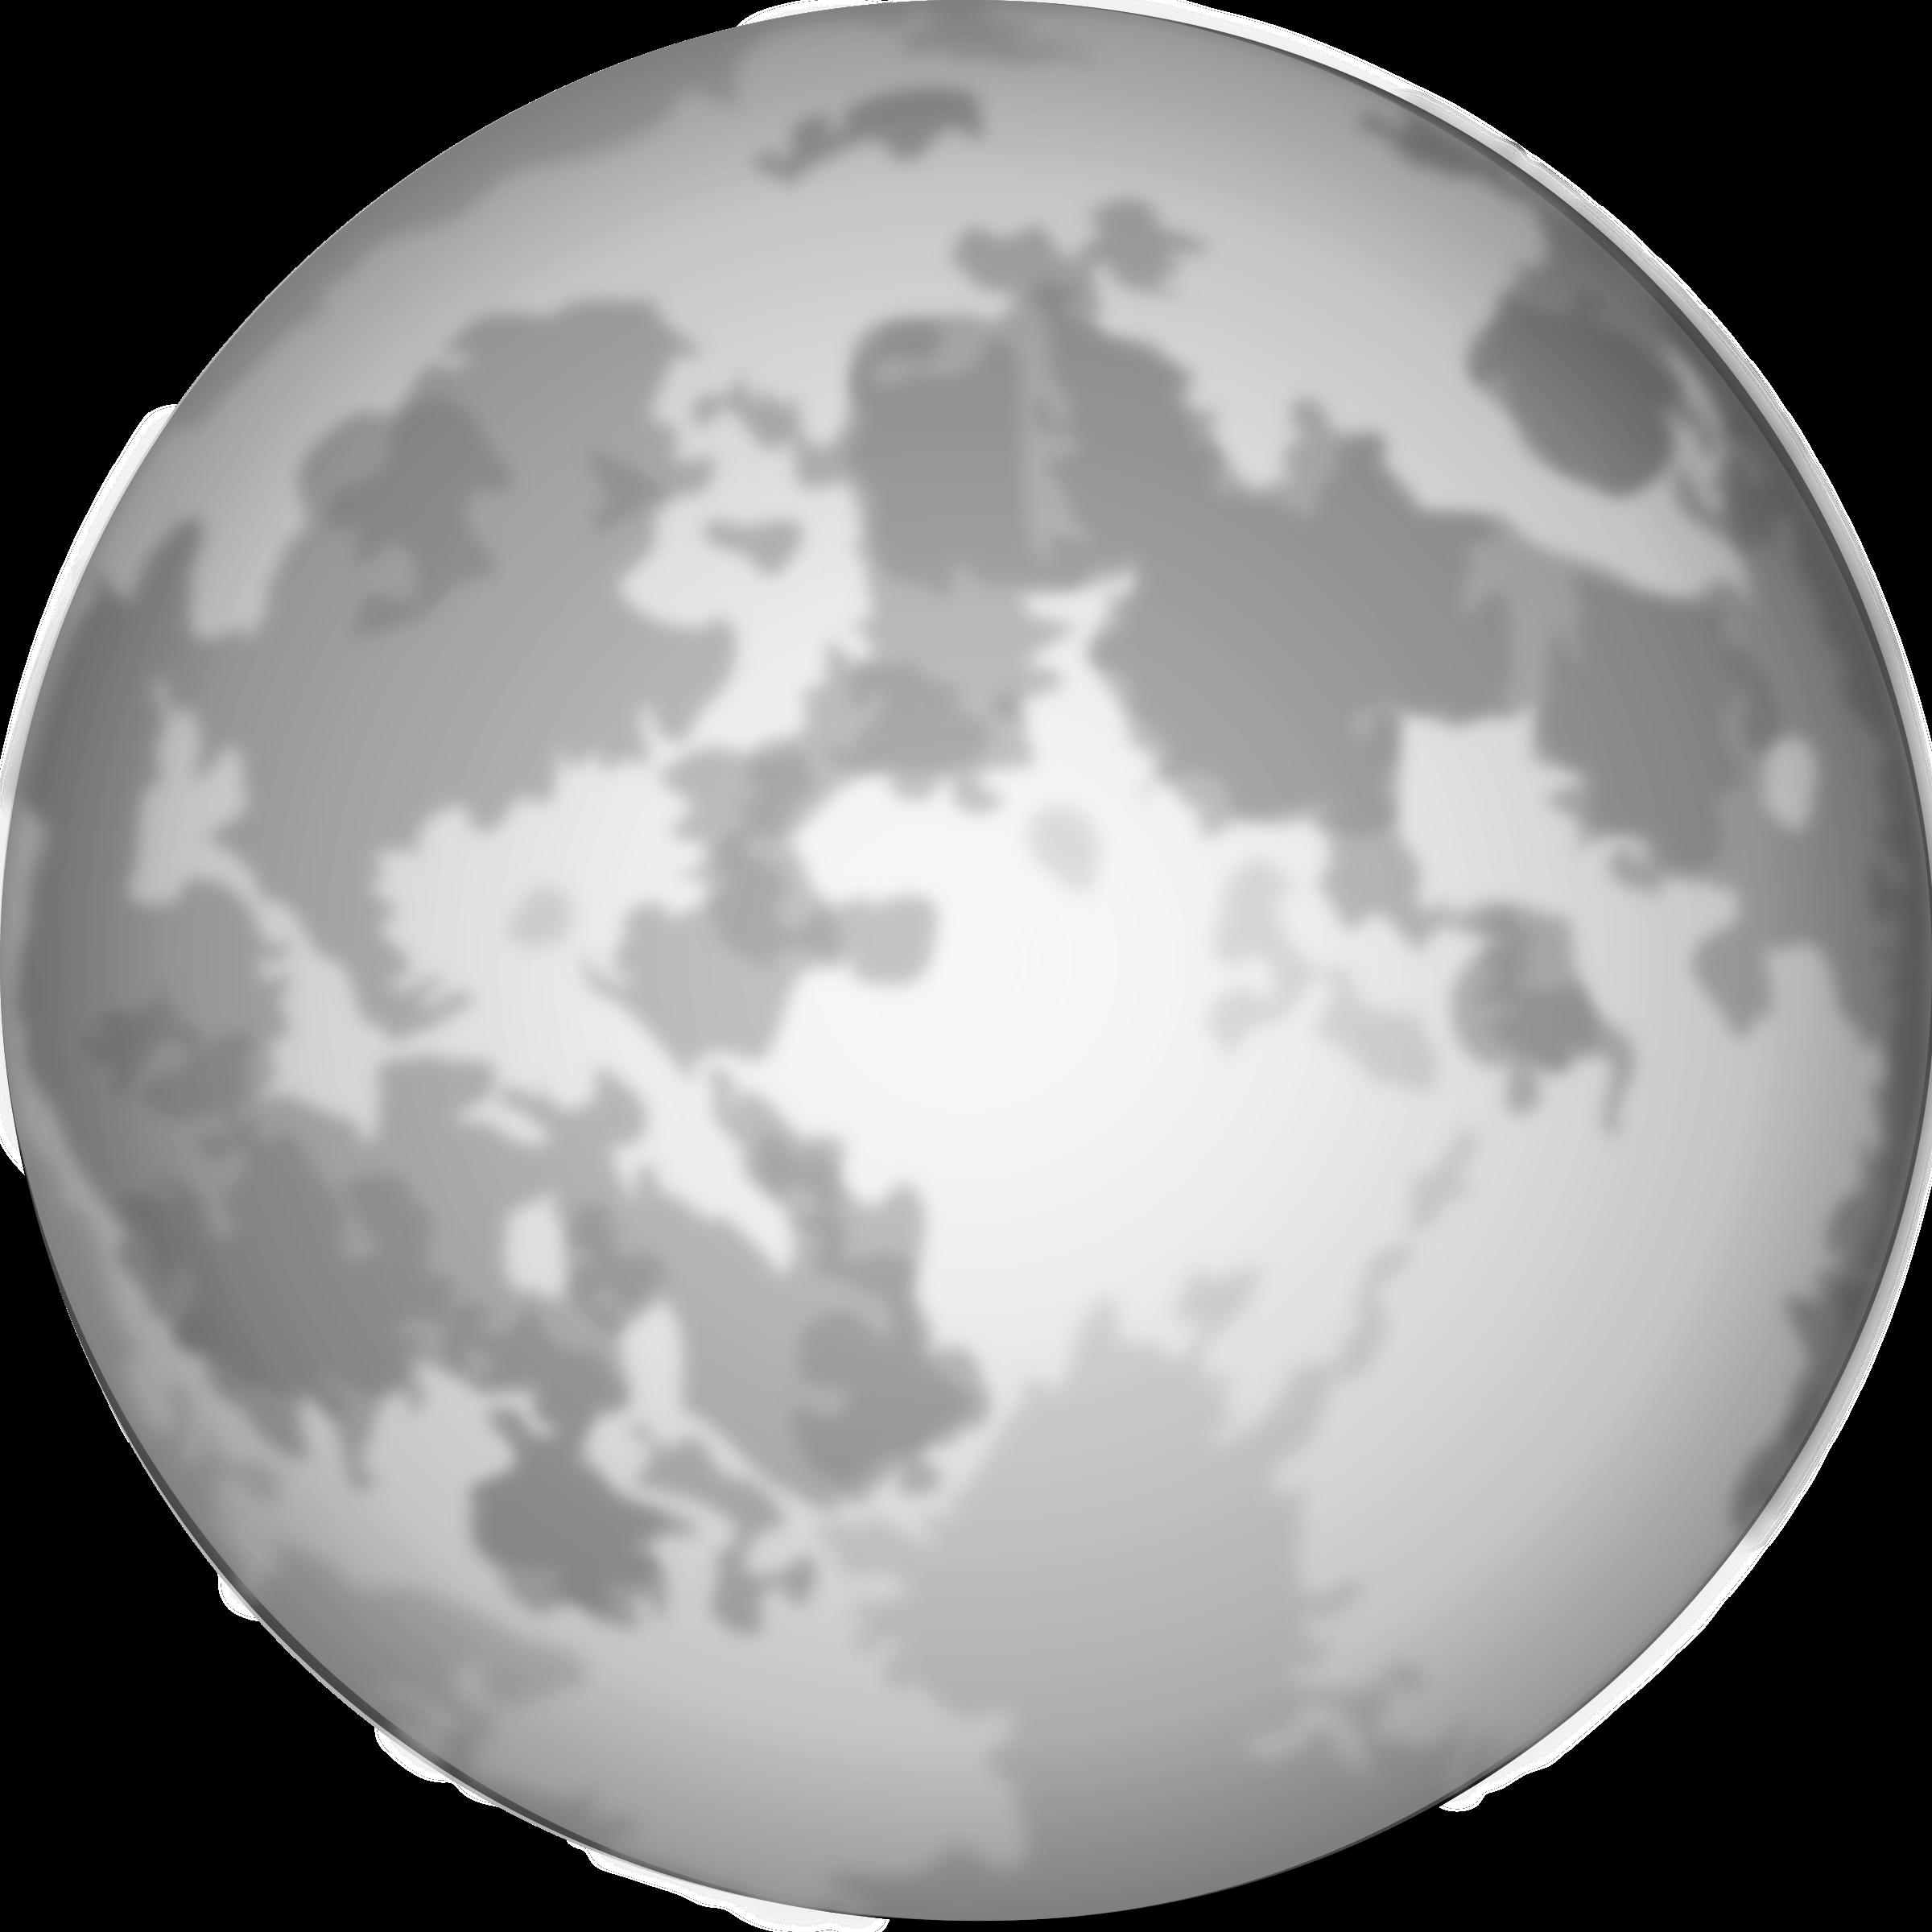 Moons clipart #2